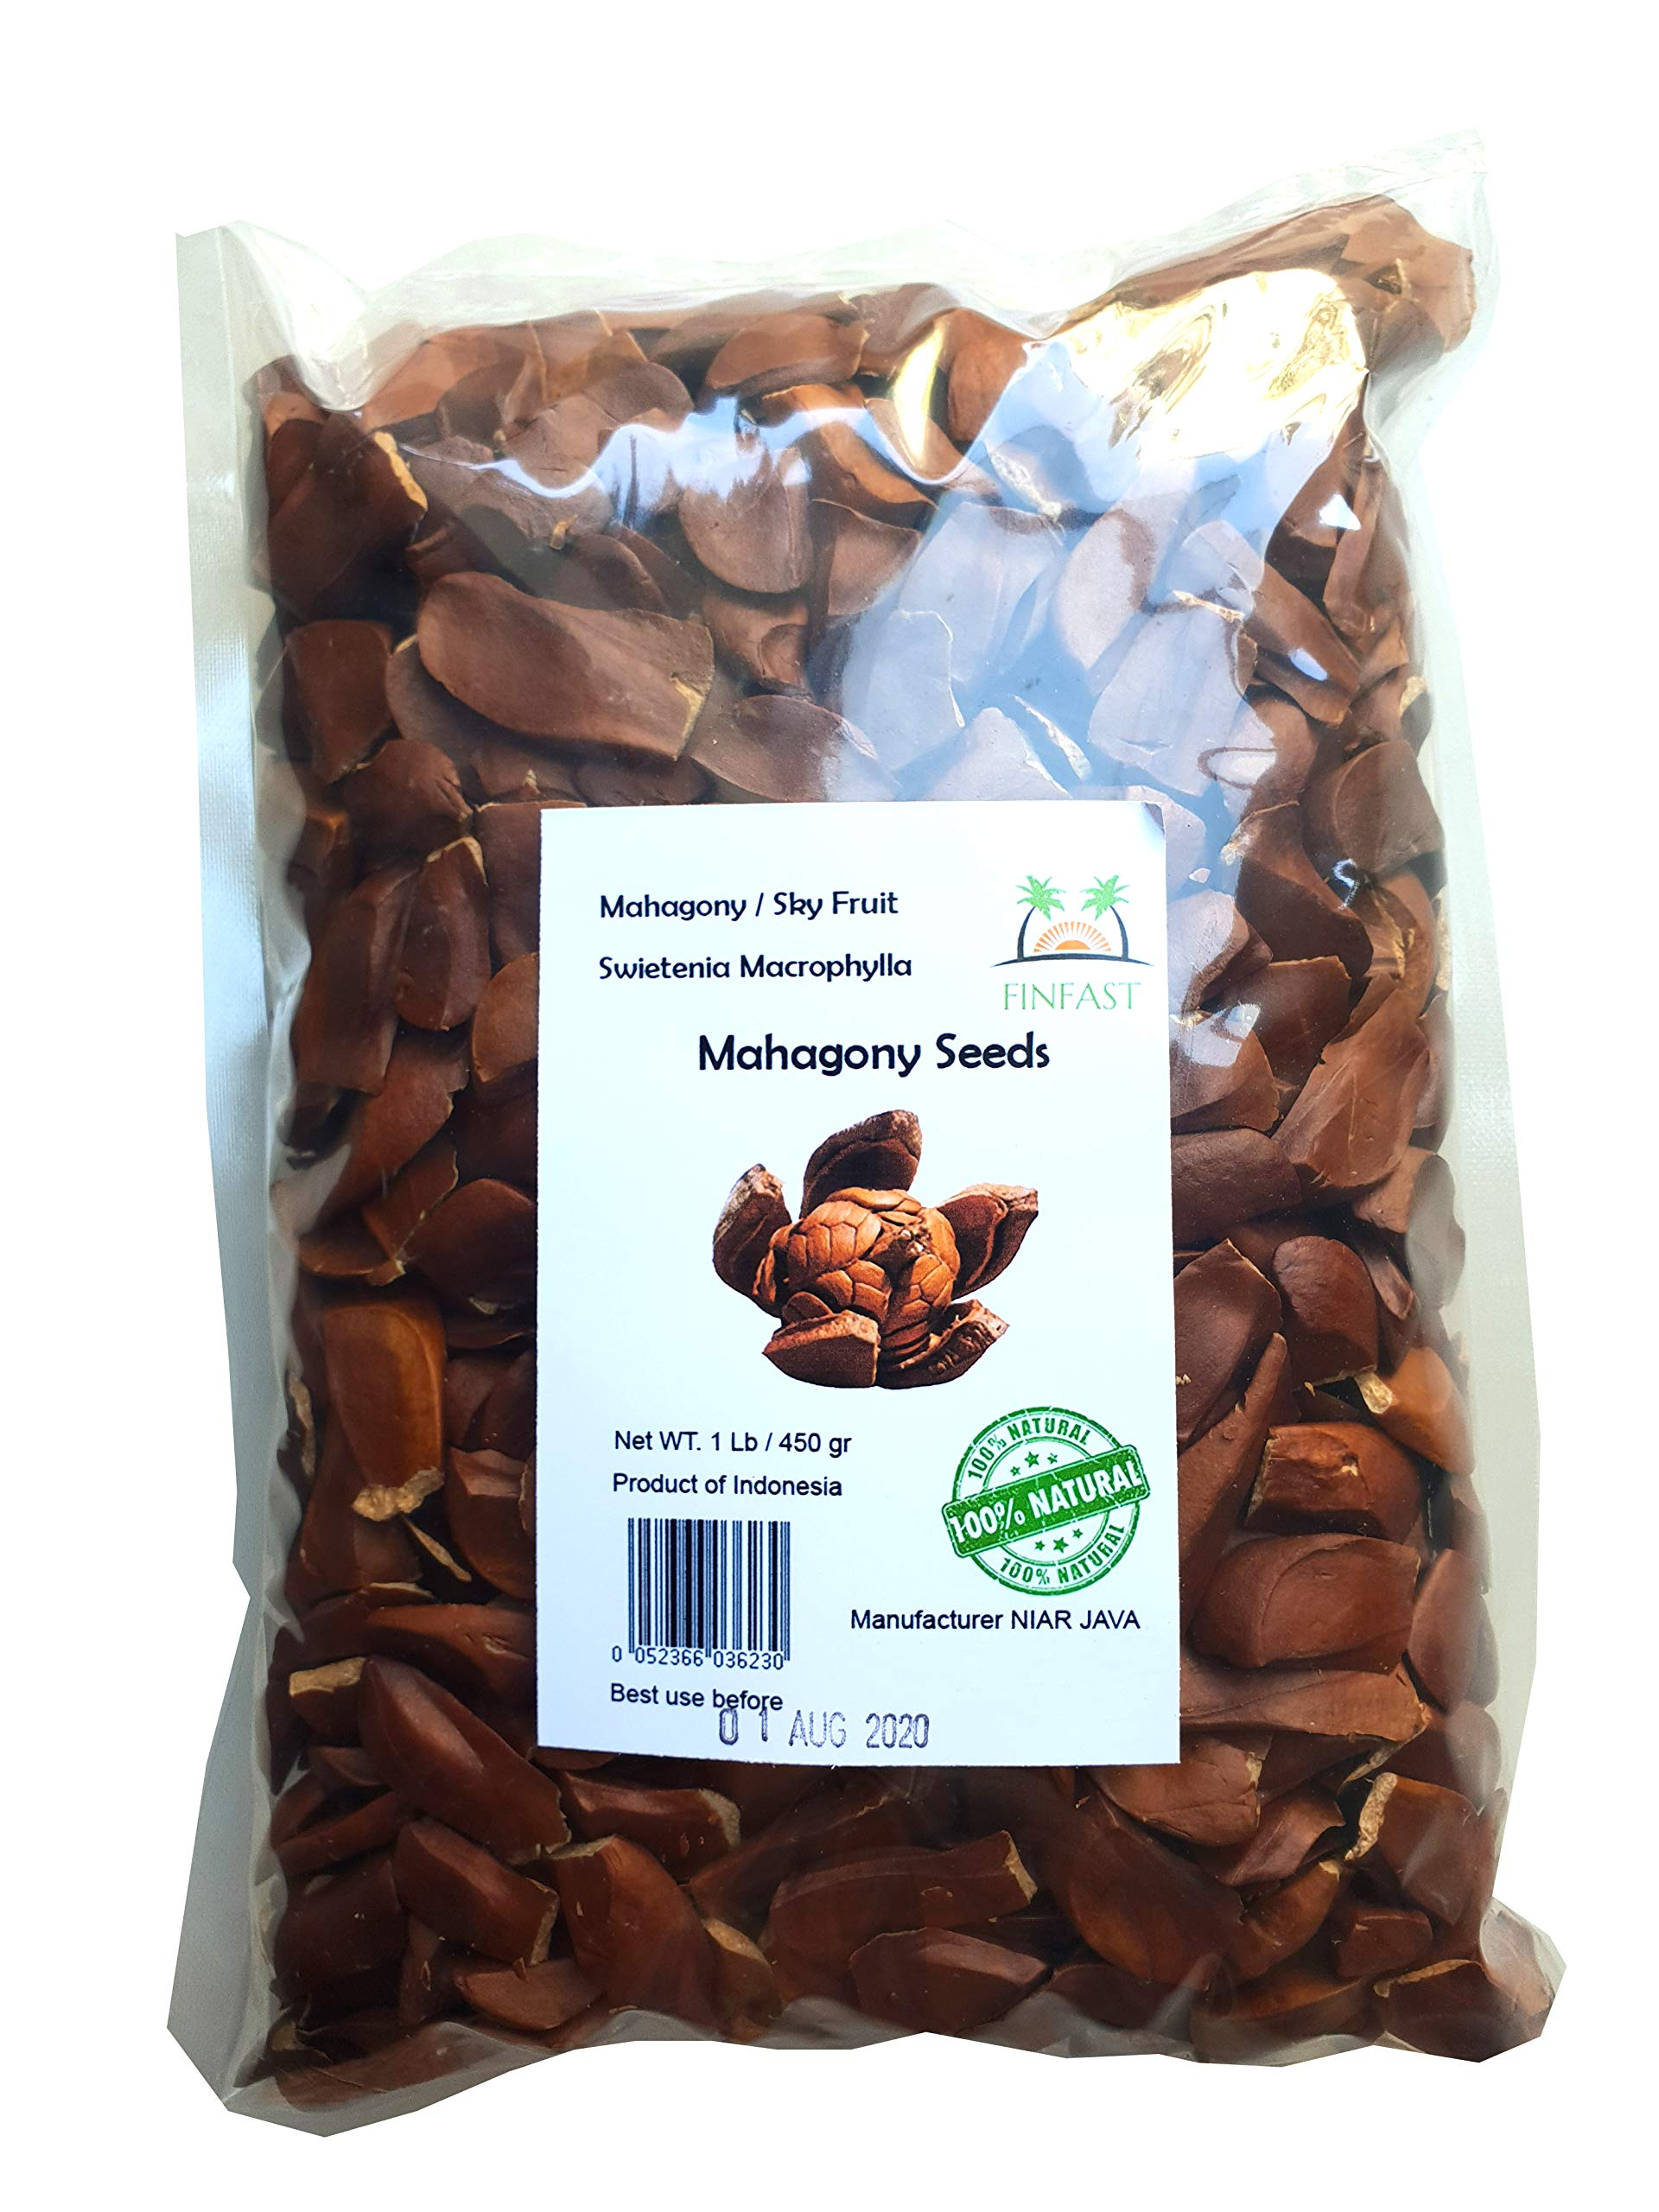 FINFAST - 1 lb Mahagony Seeds (swietenia macrophylla)